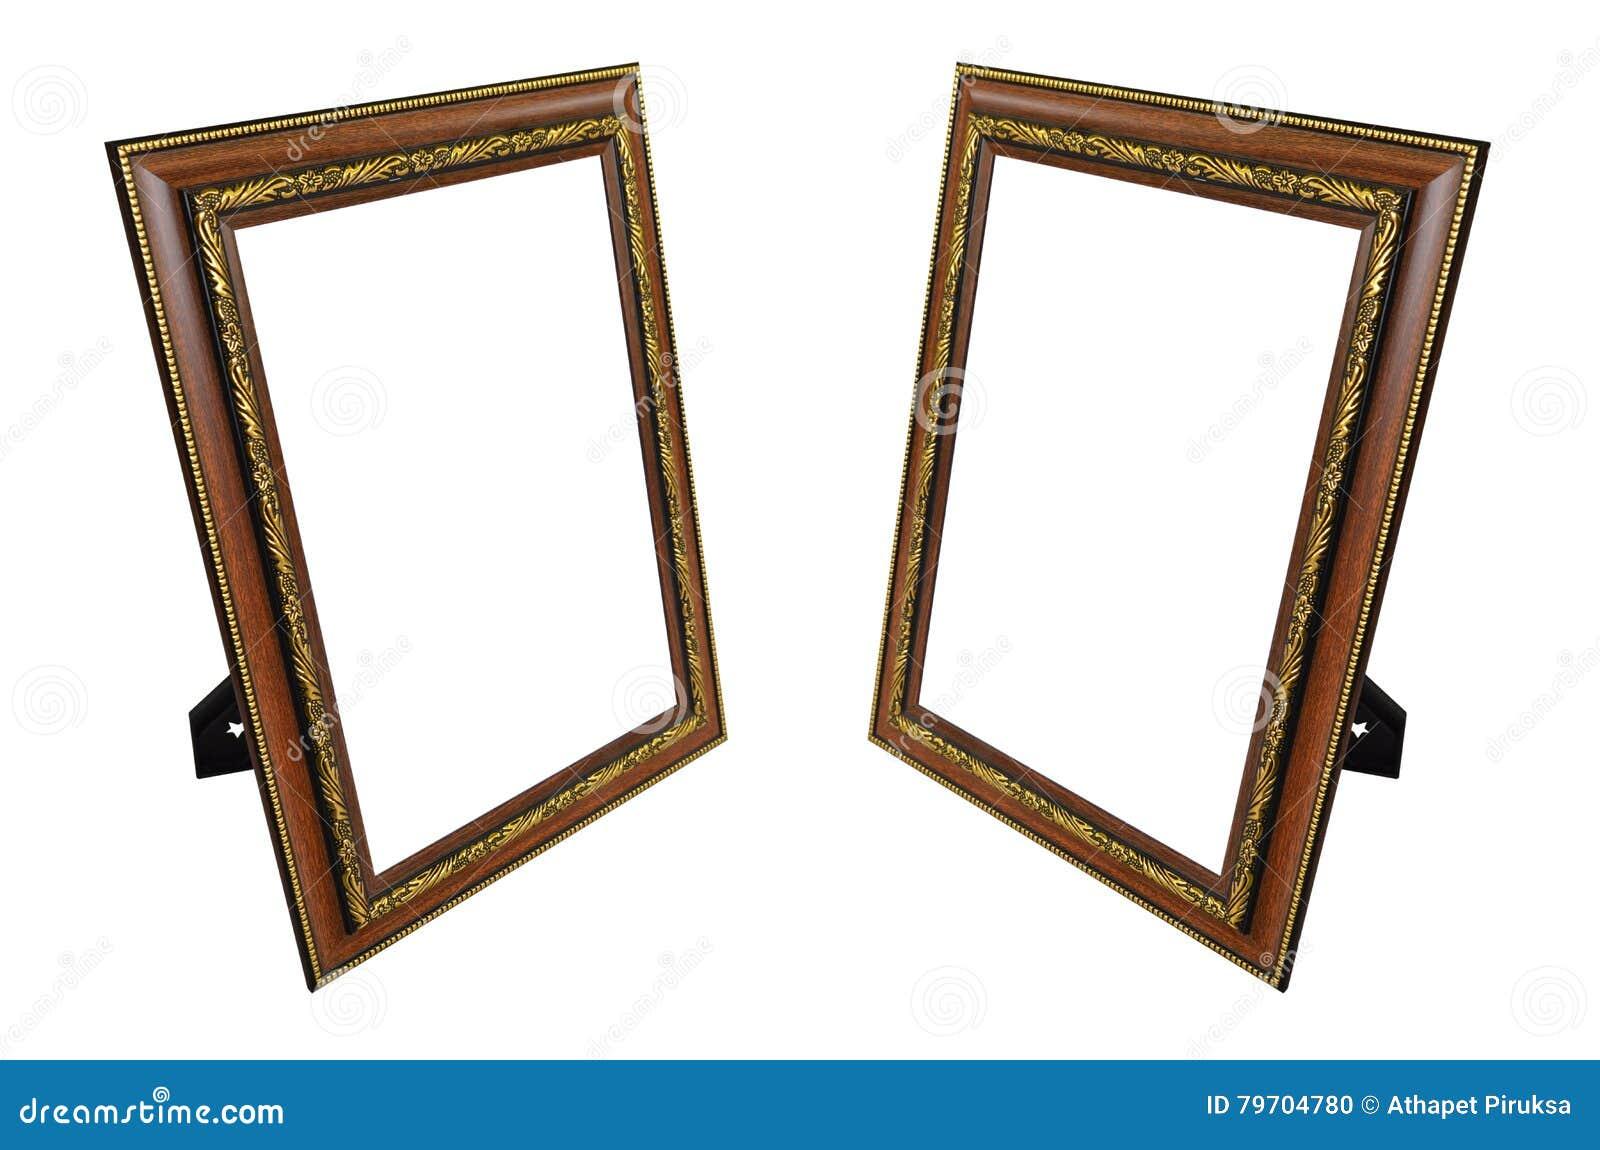 Two Teak Frames With Gold Patterns Stock Illustration - Illustration ...